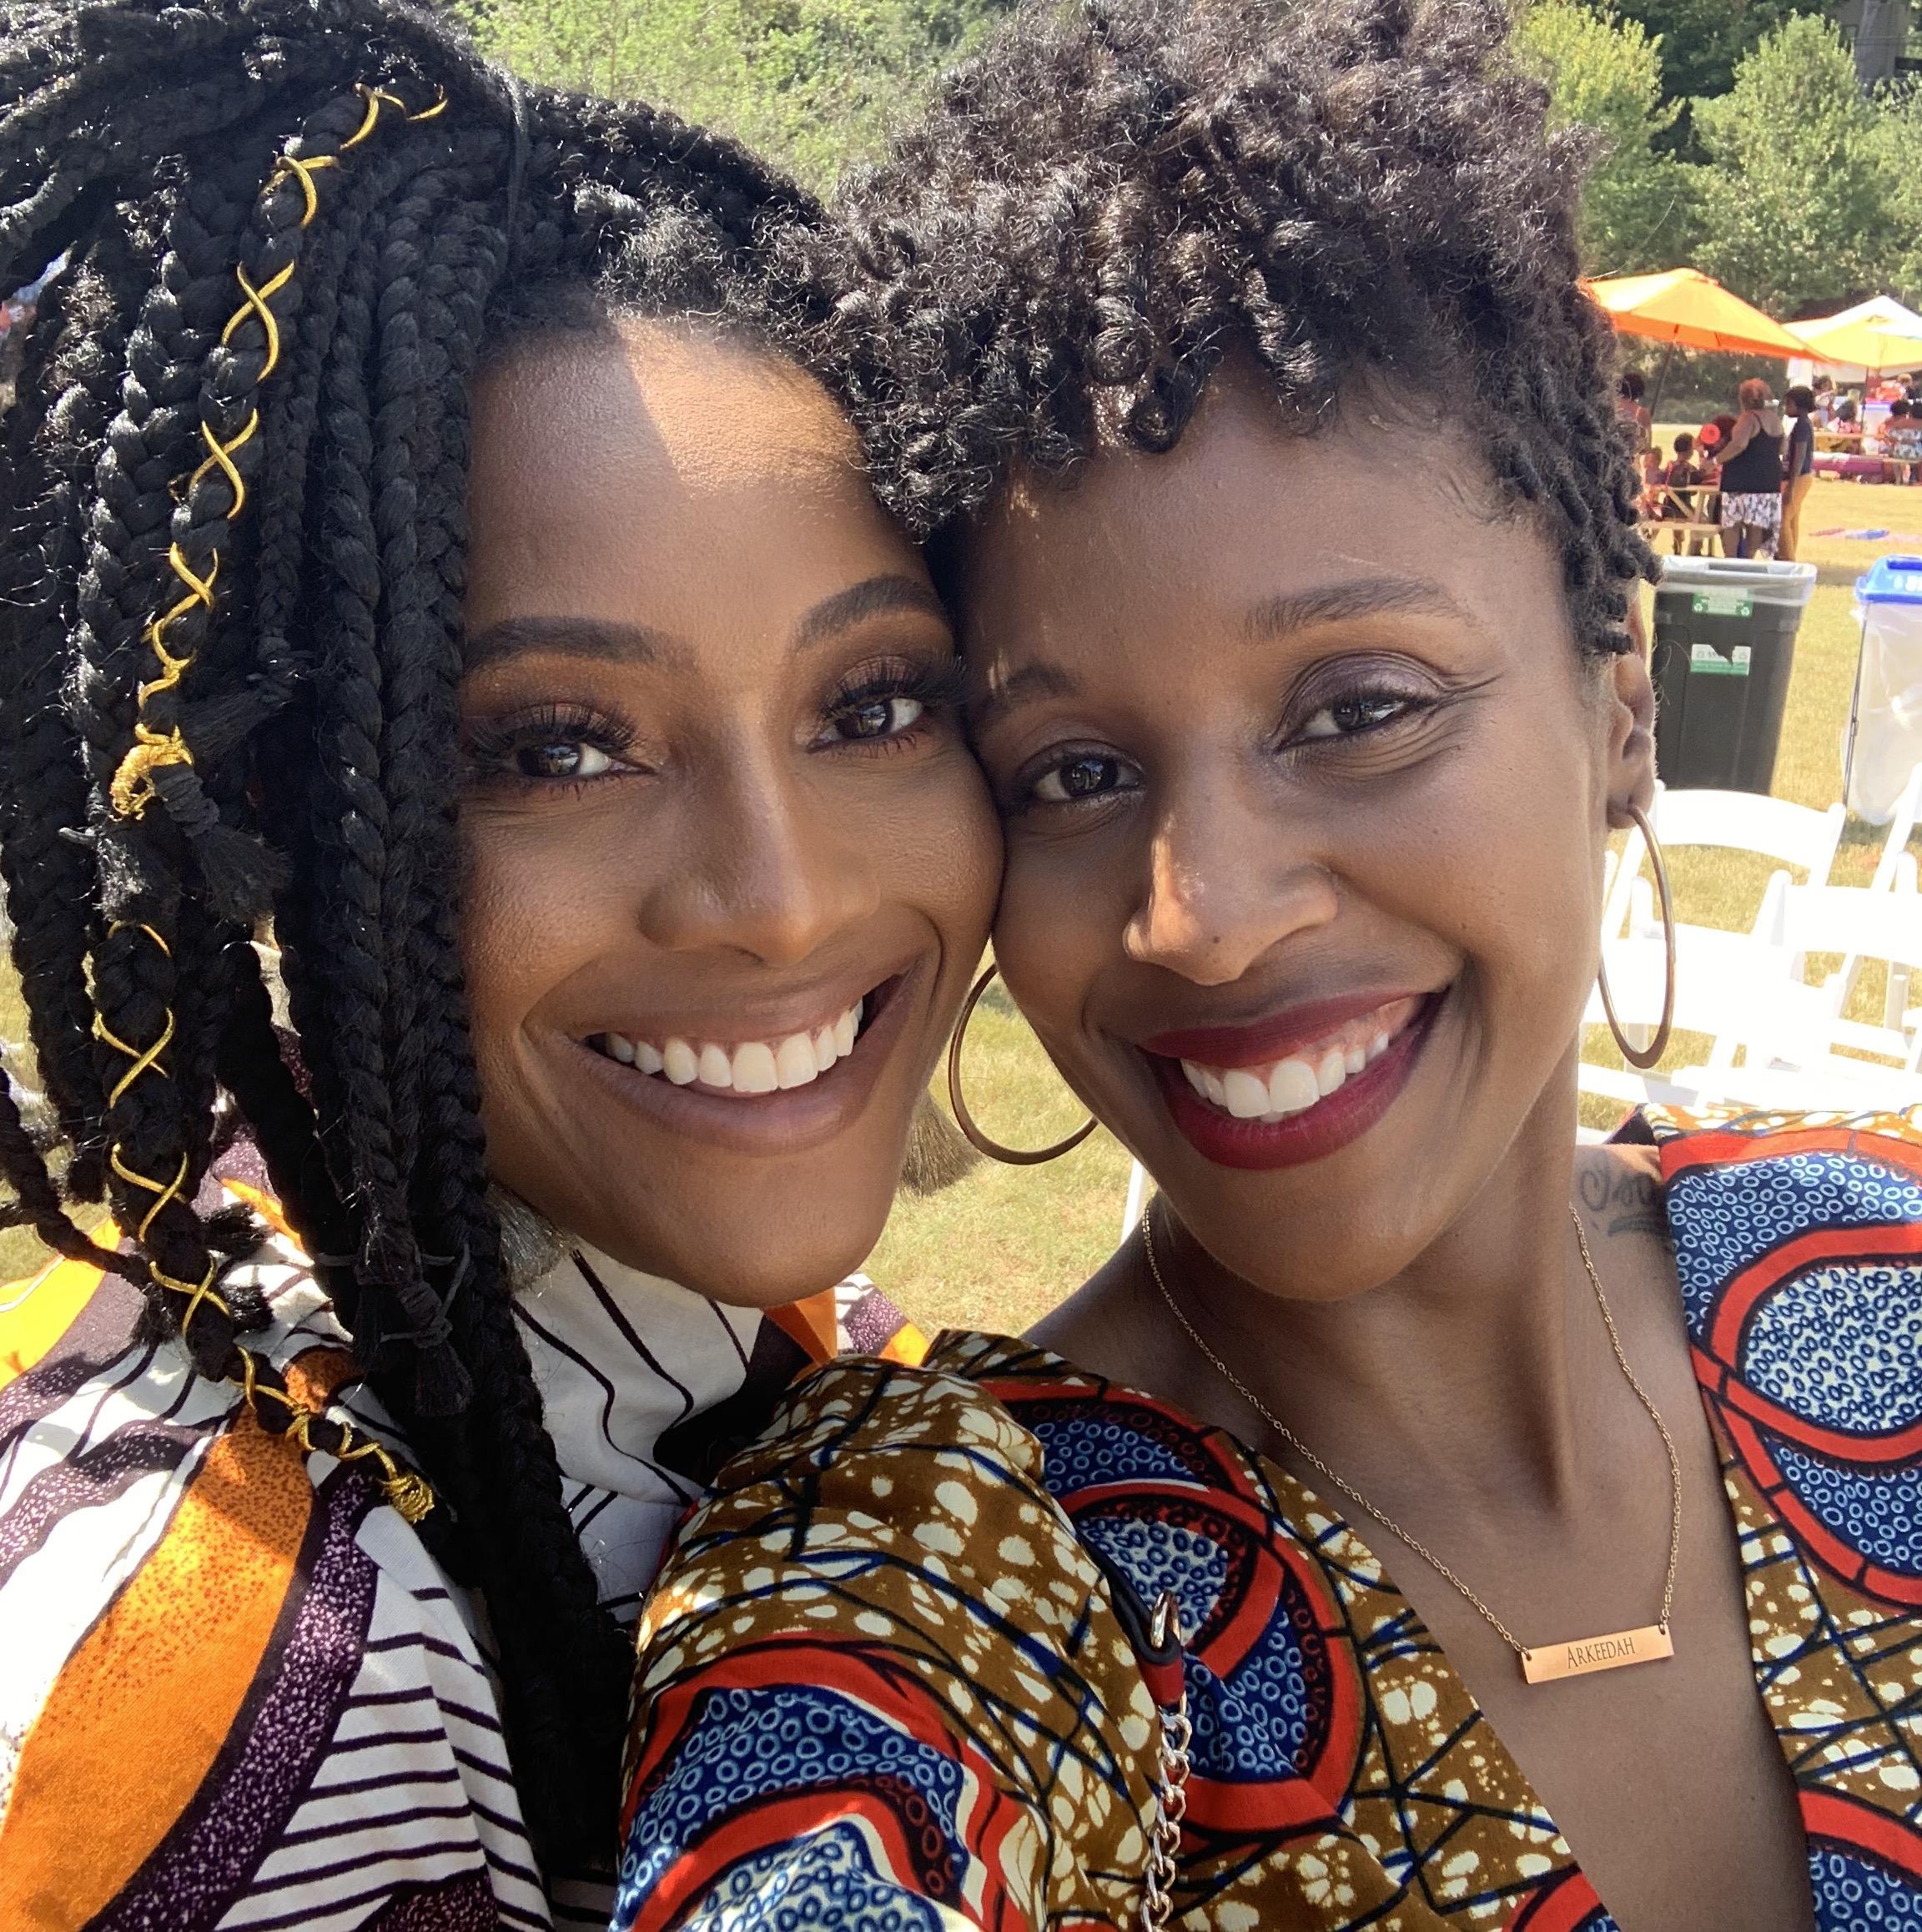 Danielle James and Arkeedah McCormick at CurlFest Atlanta